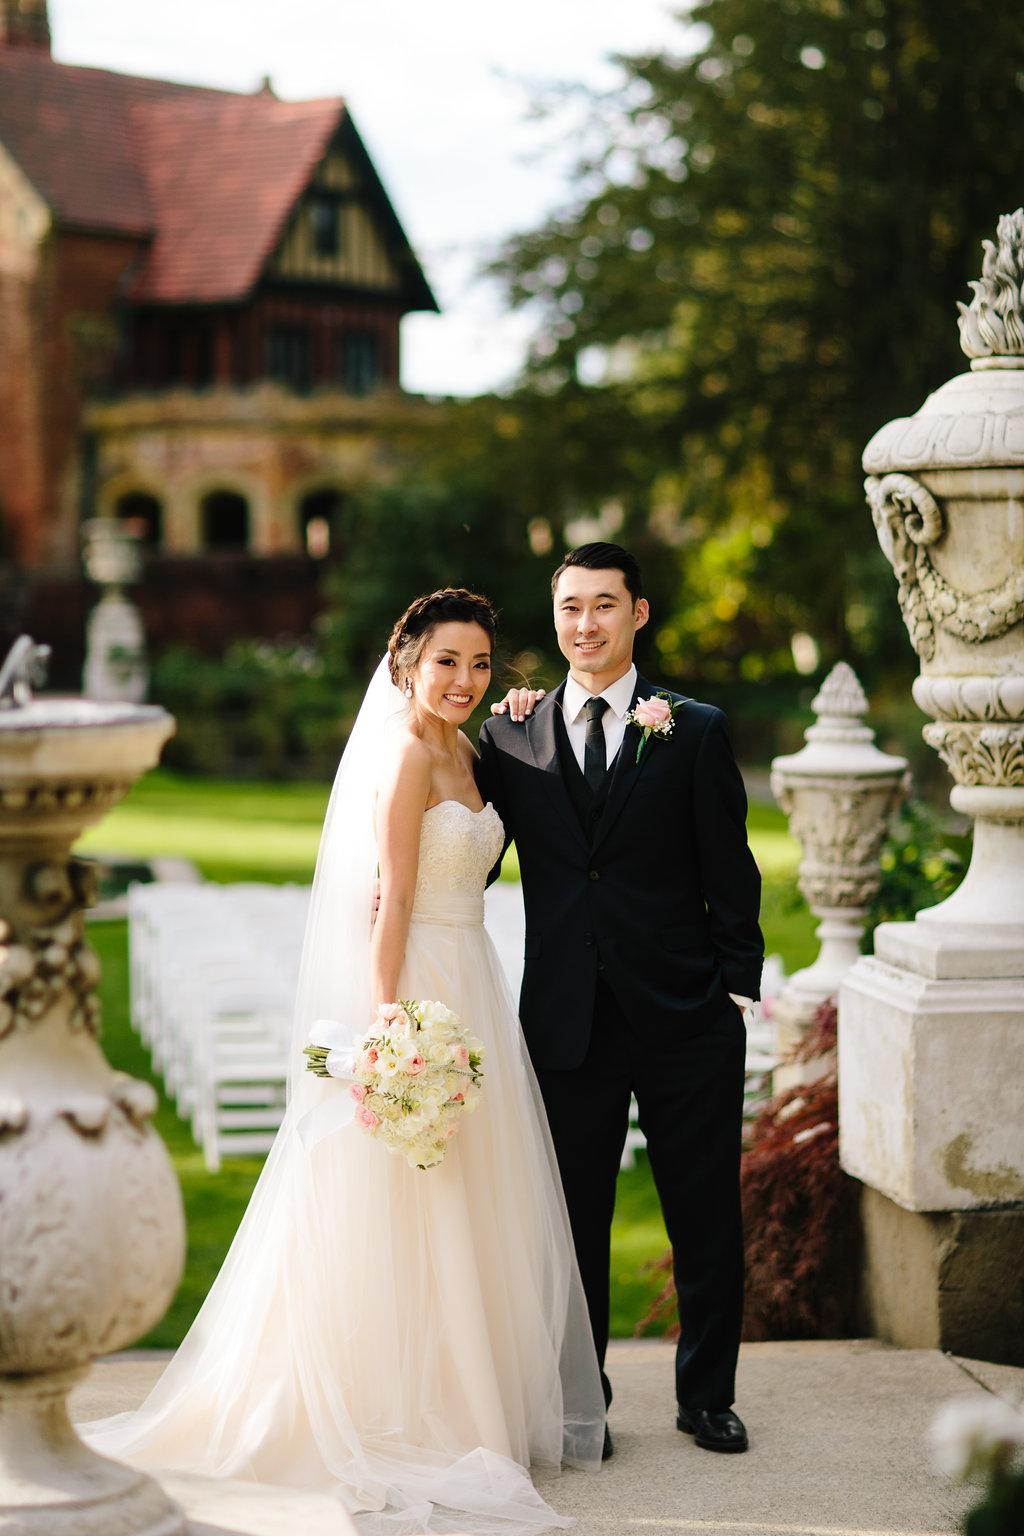 Kellylemonphotography_lucy+kento_weddingpreviews-44.jpg